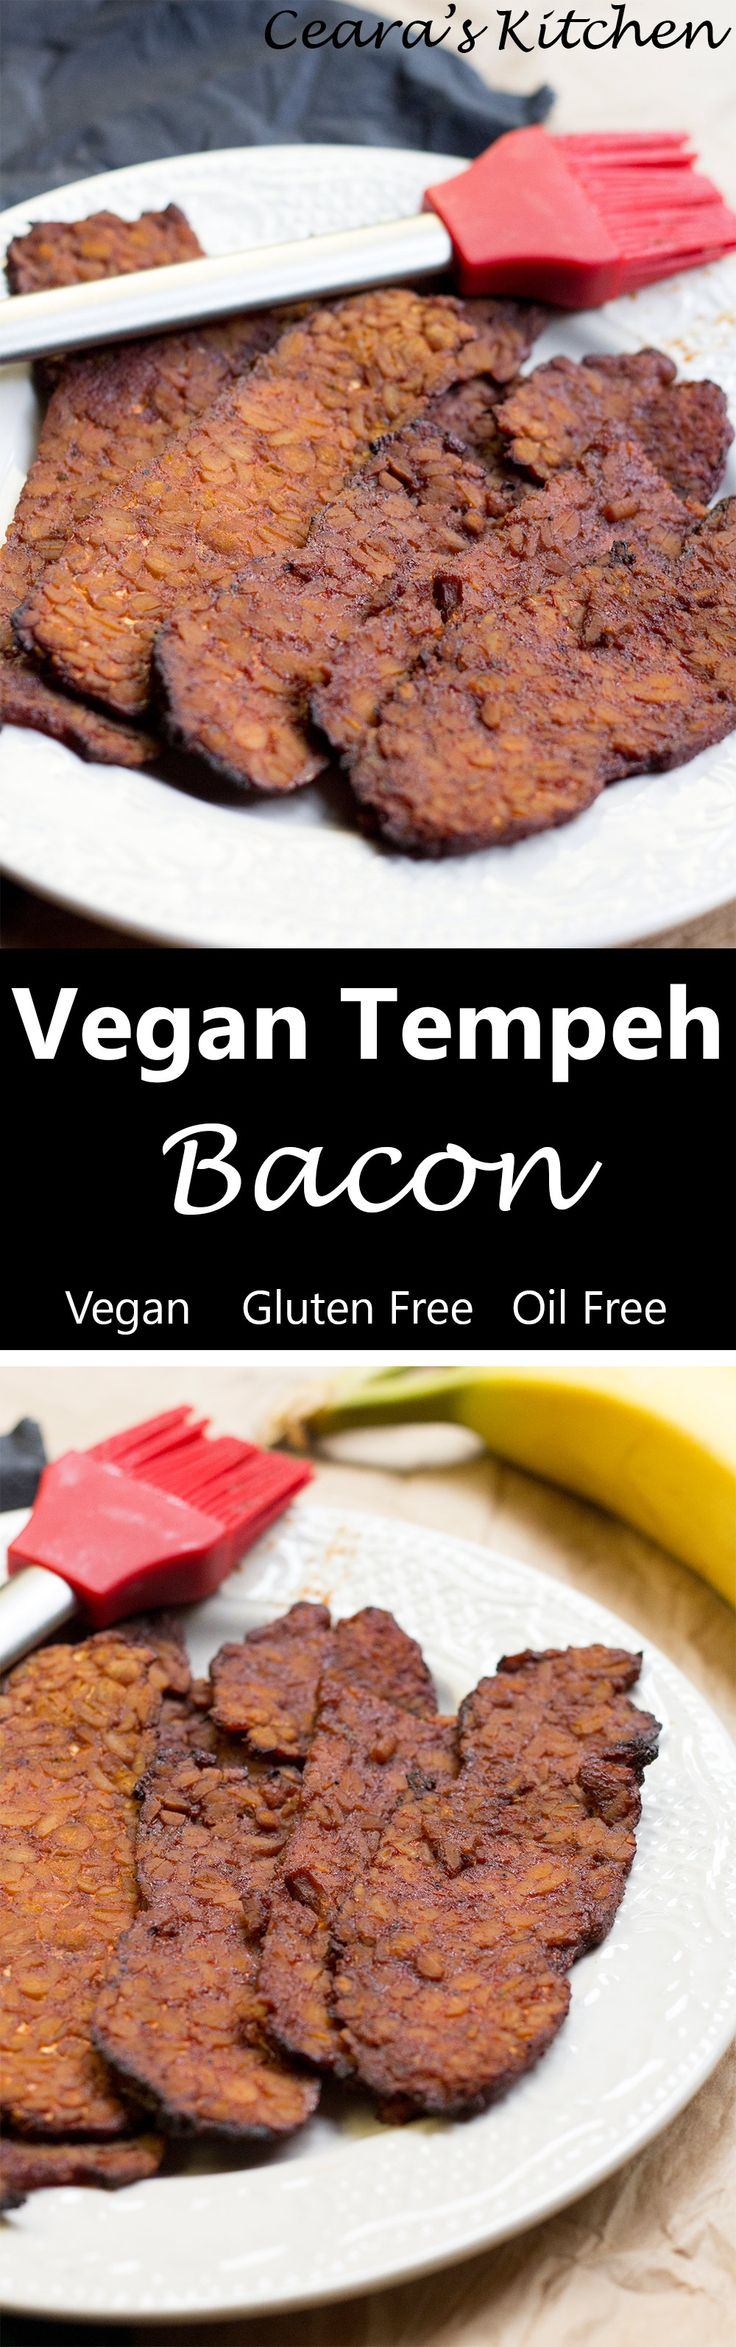 Vegan Tempeh Bacon (Baked!)